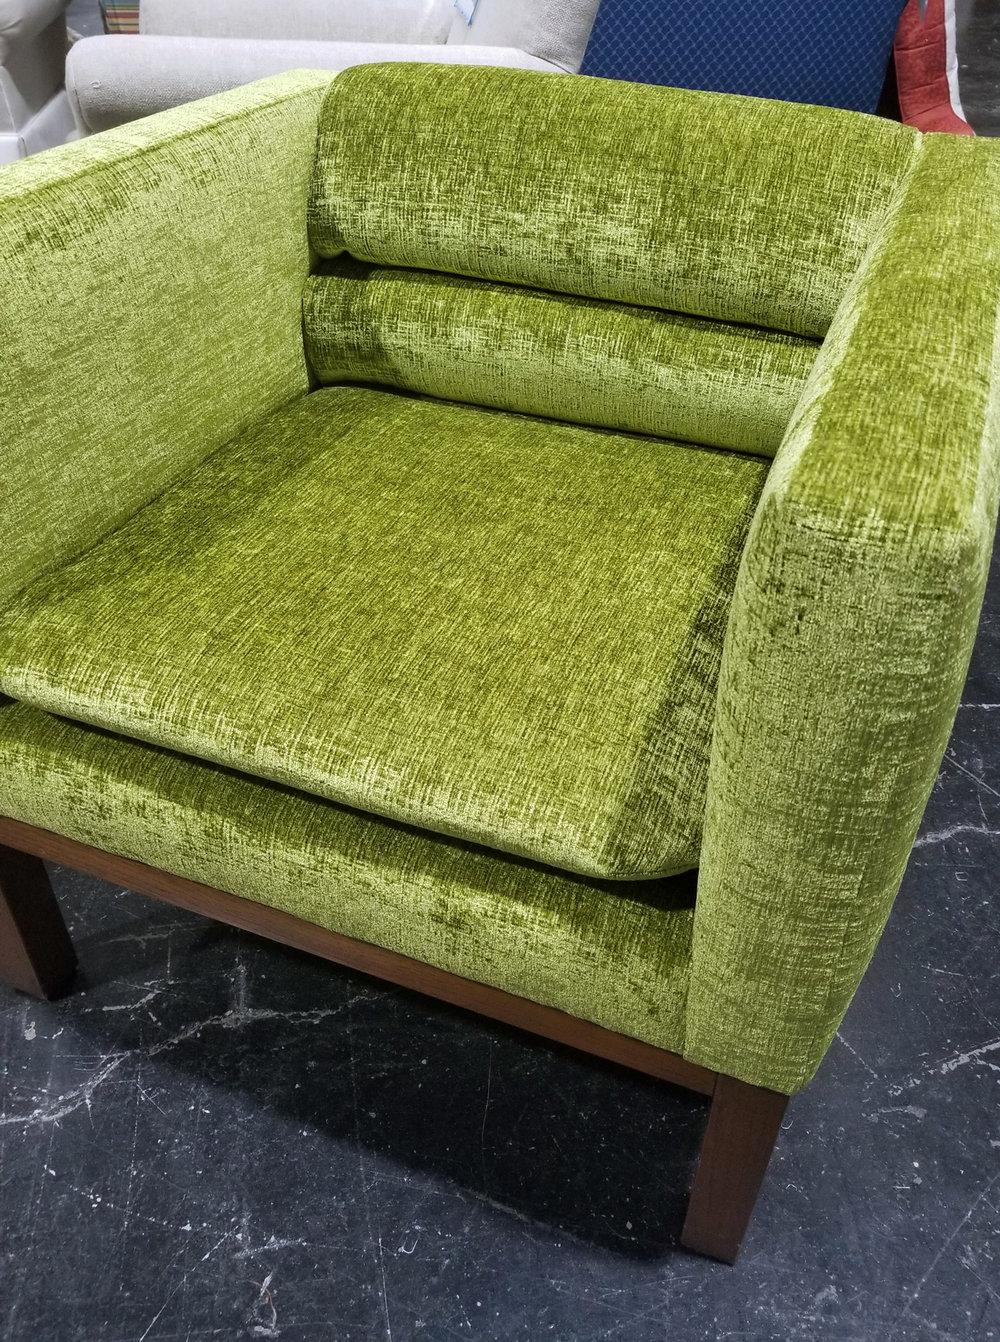 centuryupholstery_chair3.jpg